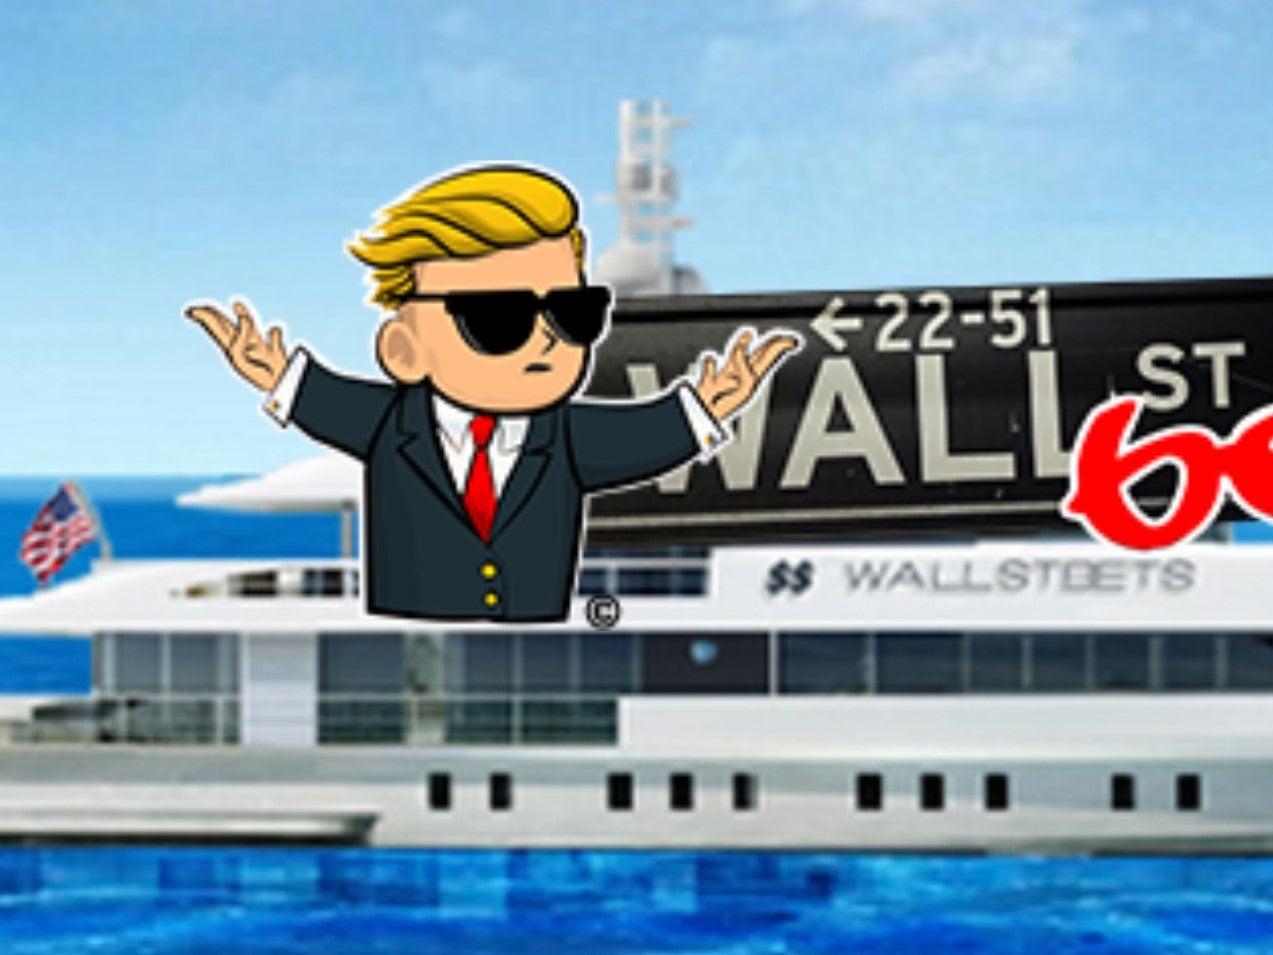 GameStop investor Roaring Kitty who led Reddit stock war speaks out